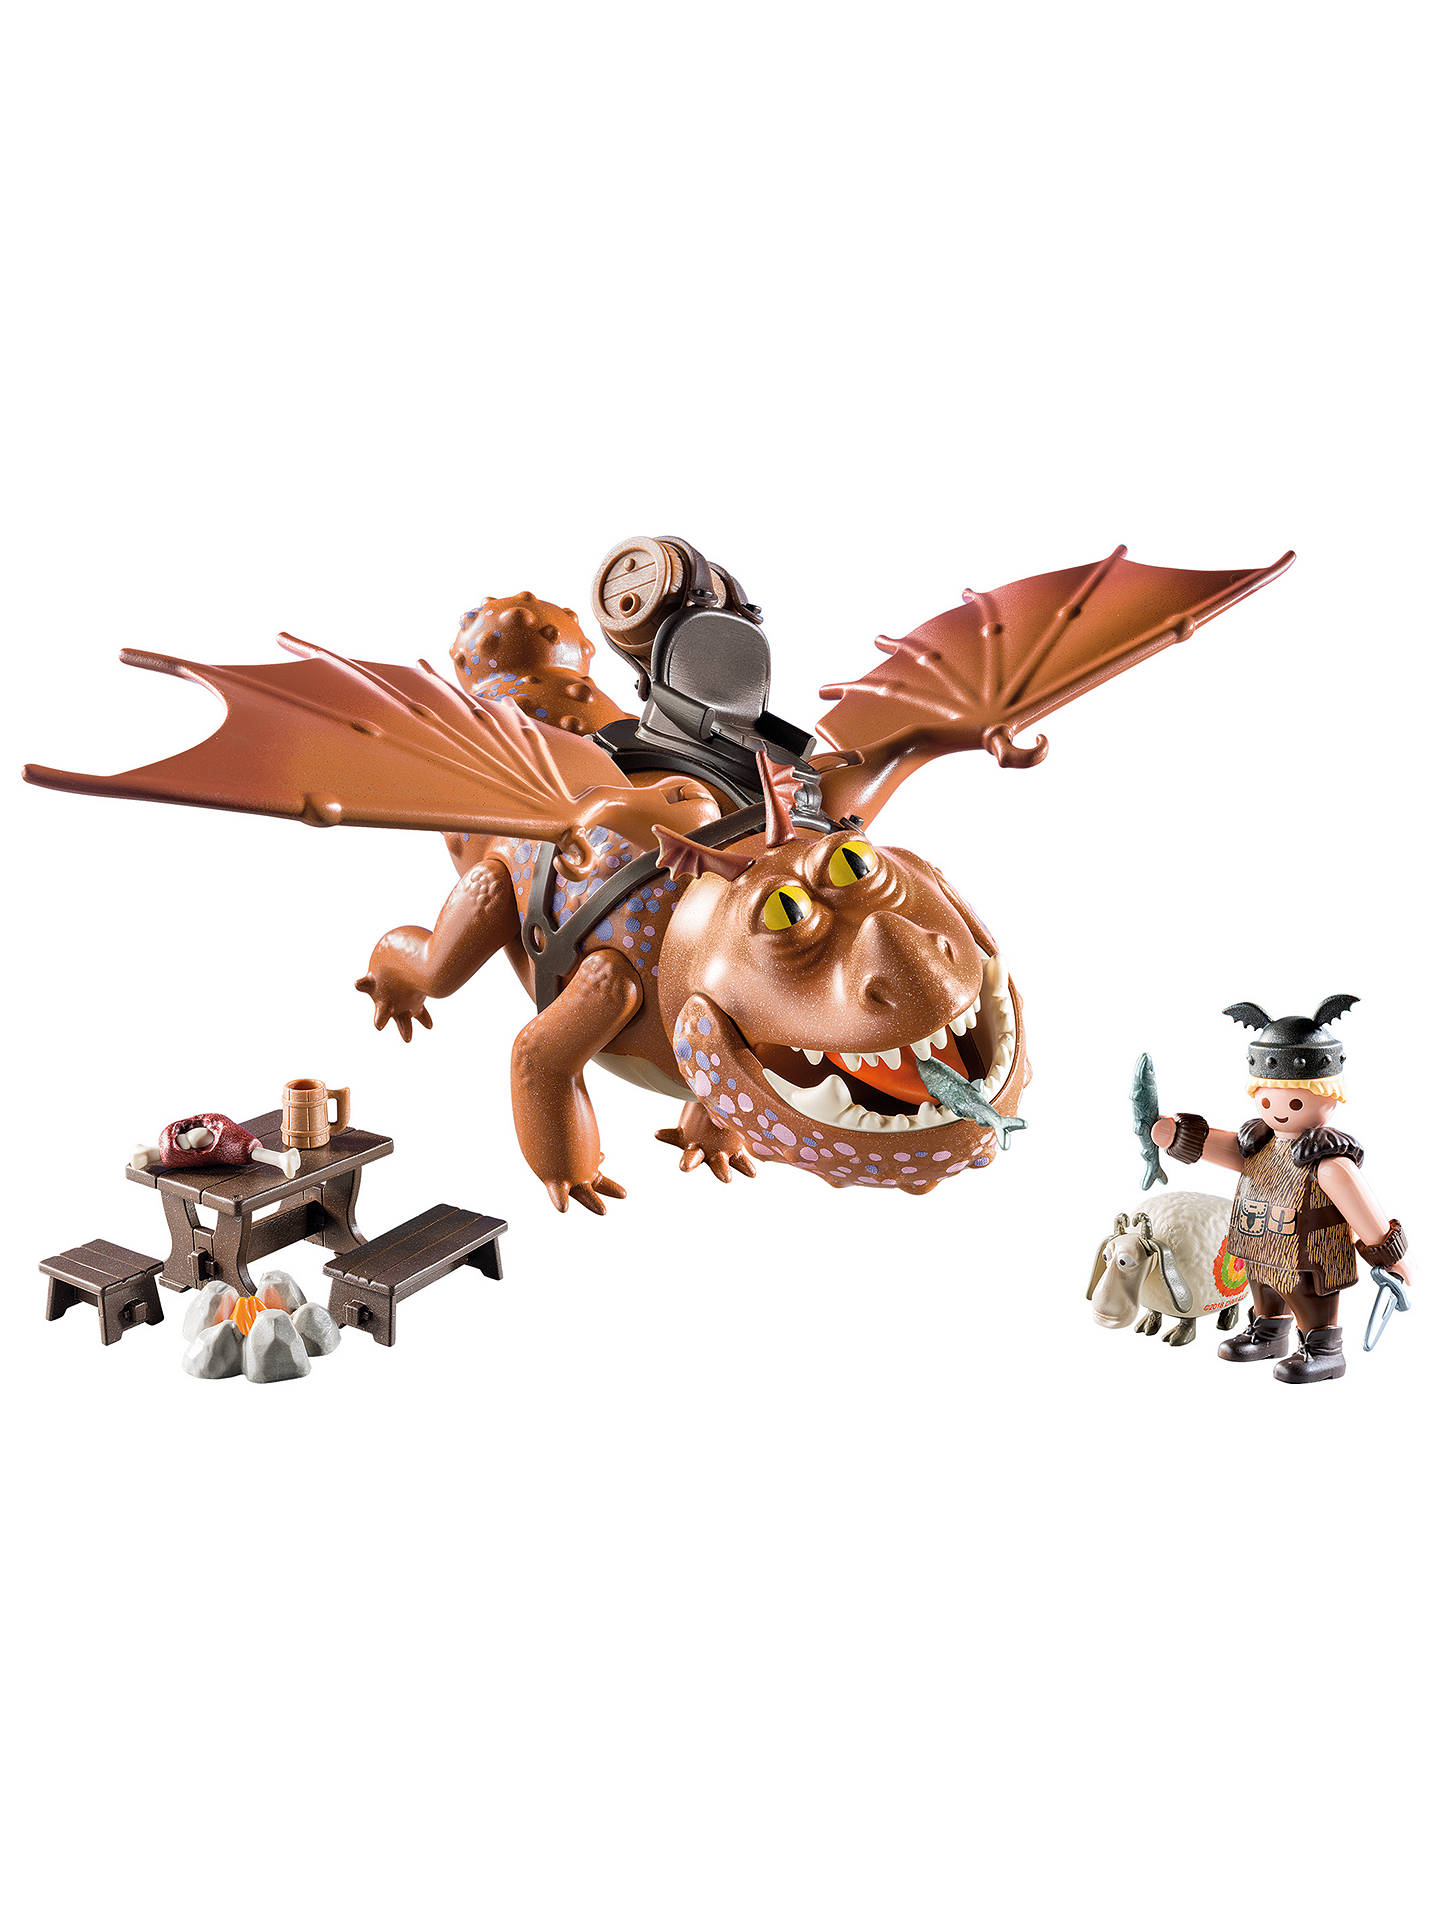 Playmobil Dragons 9460 Fishlegs With Meatlug Play Set At John Lewis